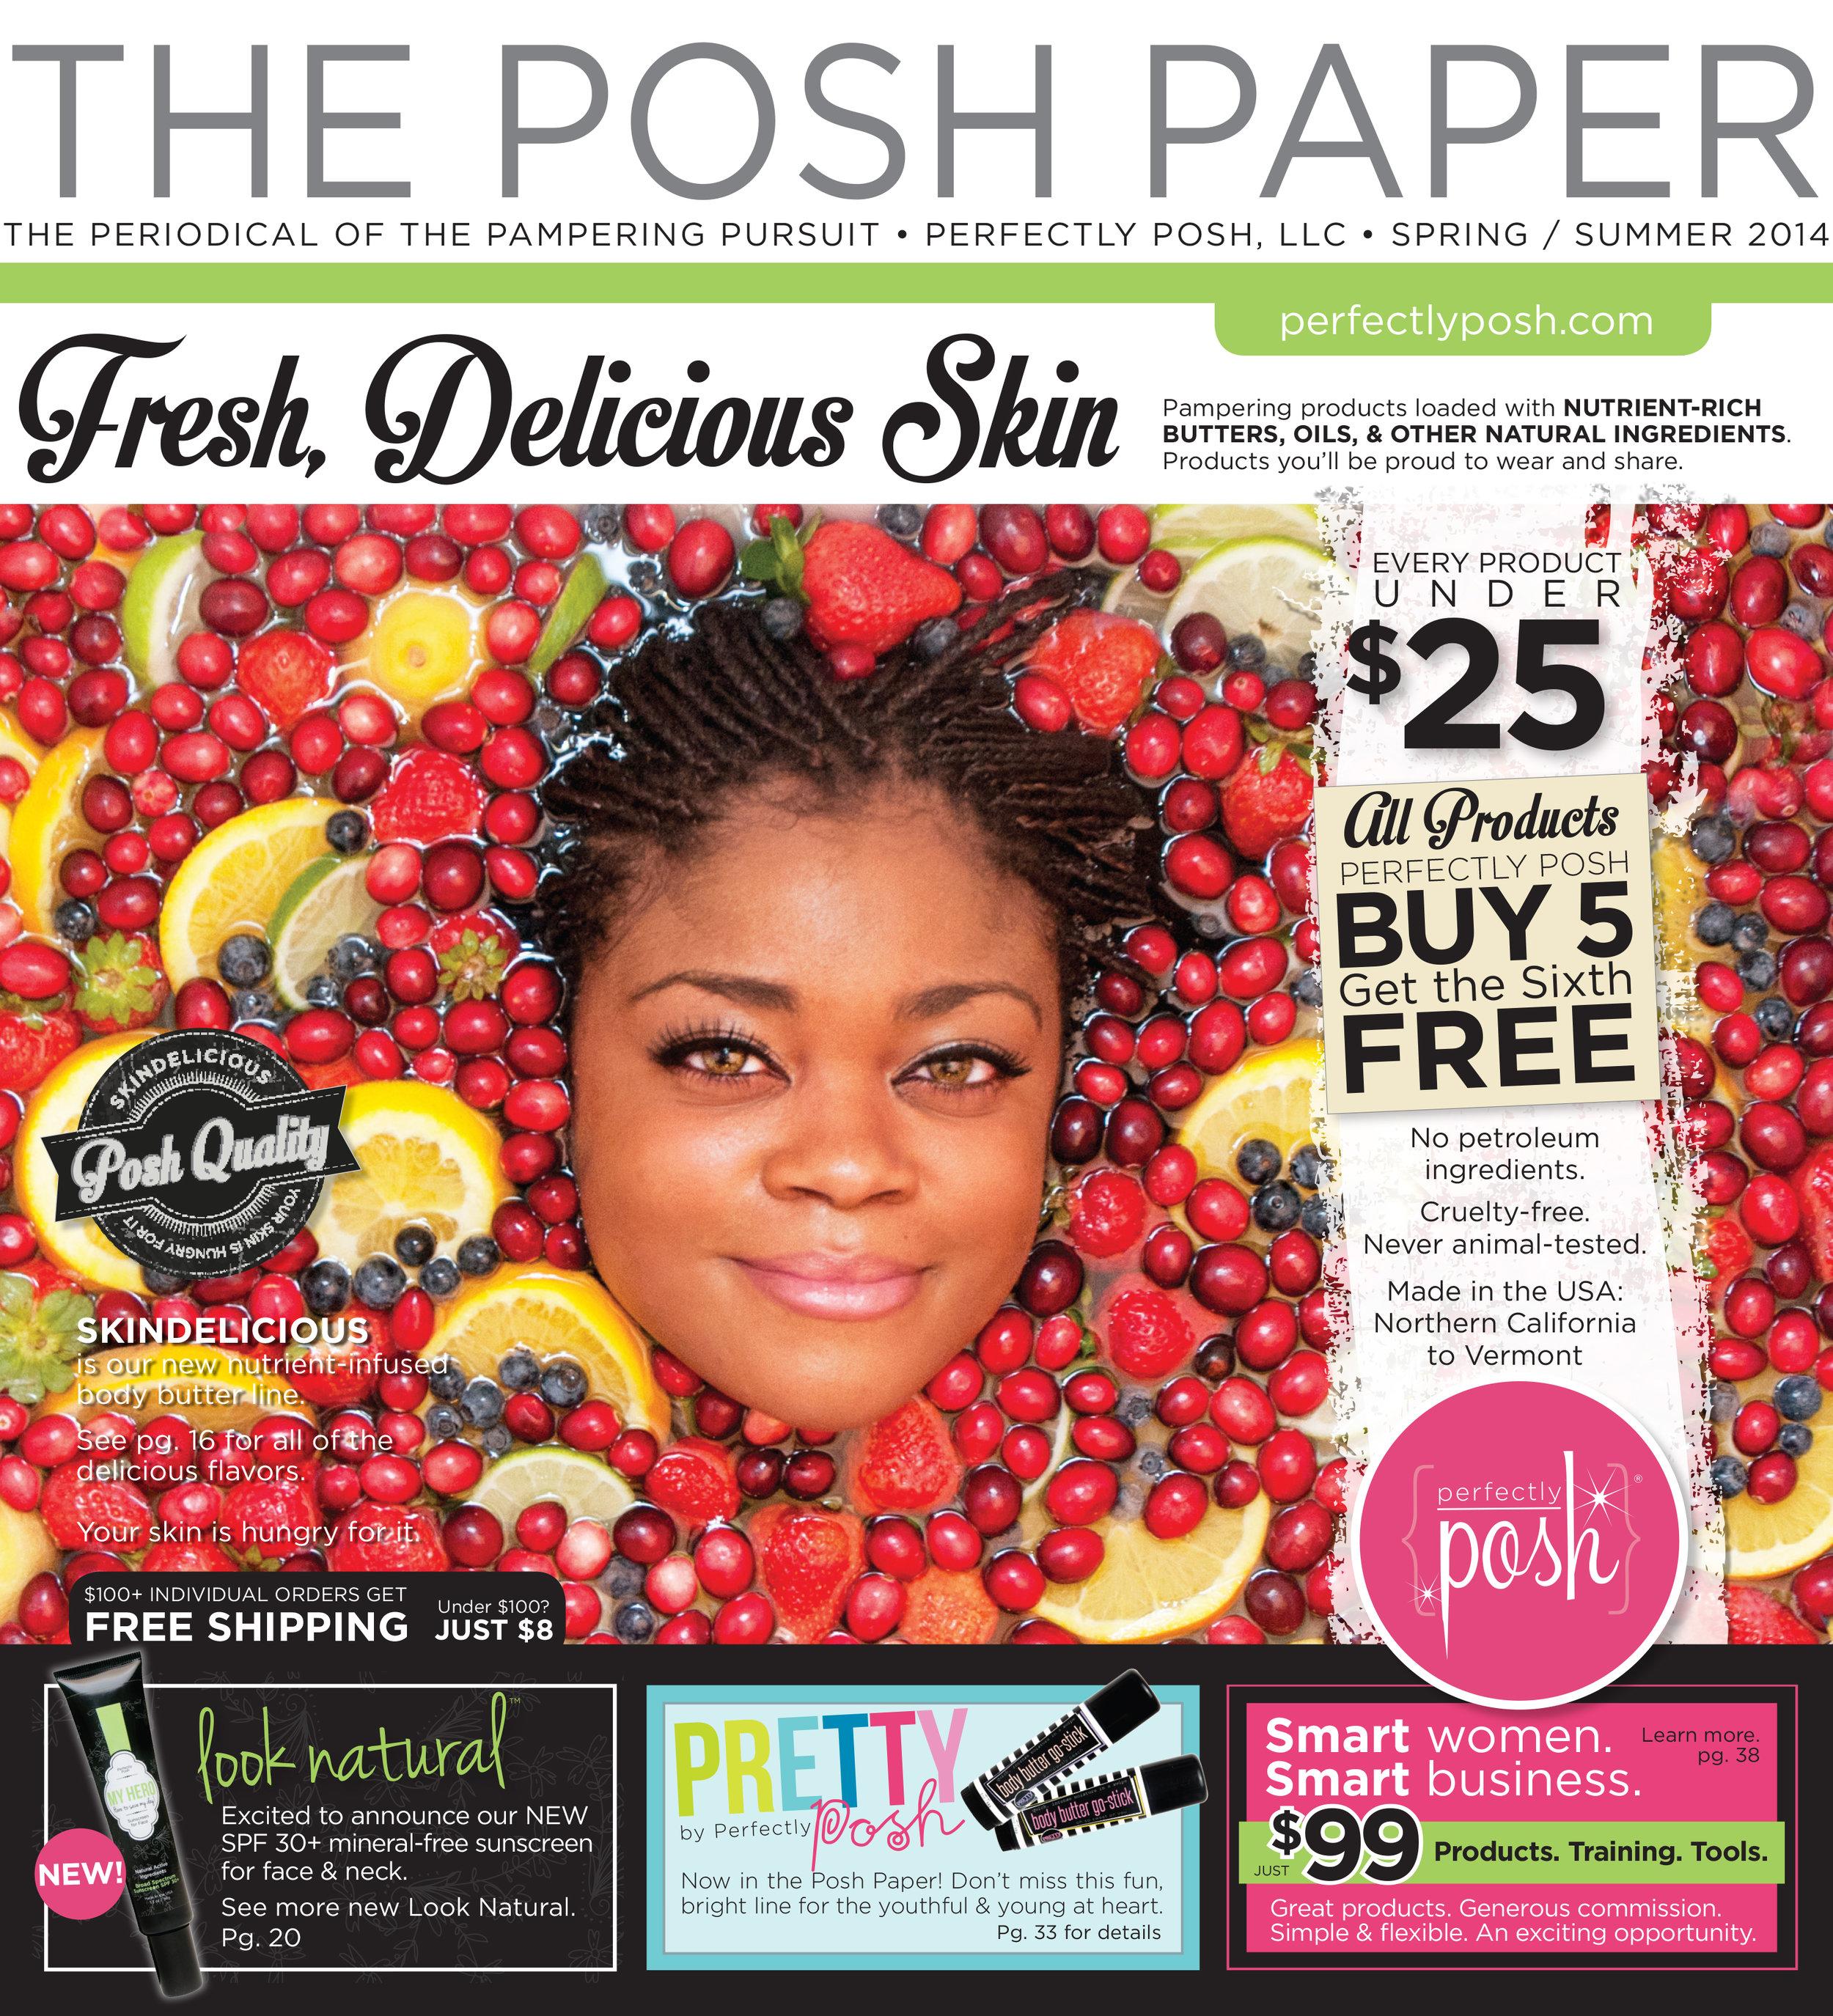 Posh Product Catalog SS14 Reprint r2.pdf-1.jpg